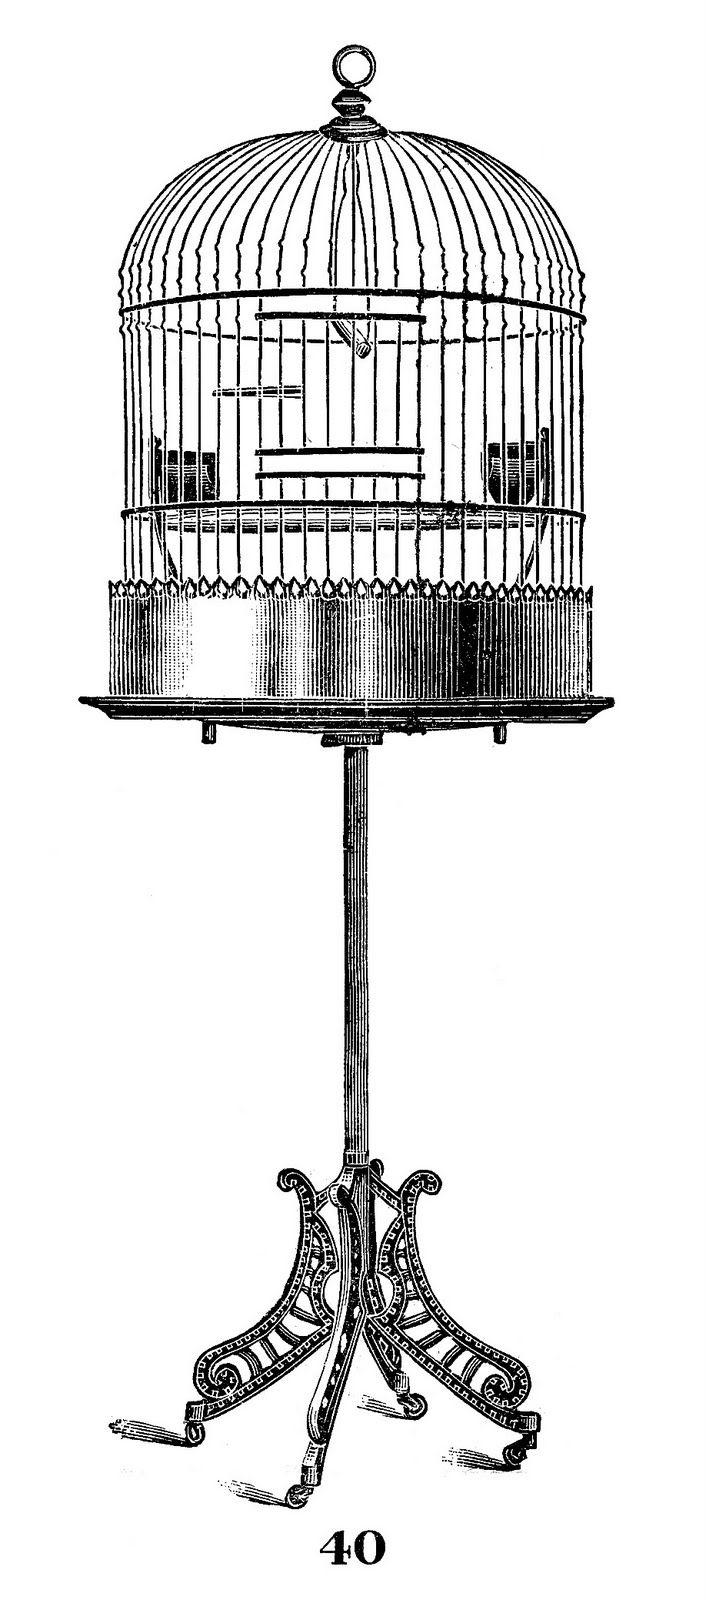 Vintage Image - Wonderful Bird Cage - The Graphics Fairy